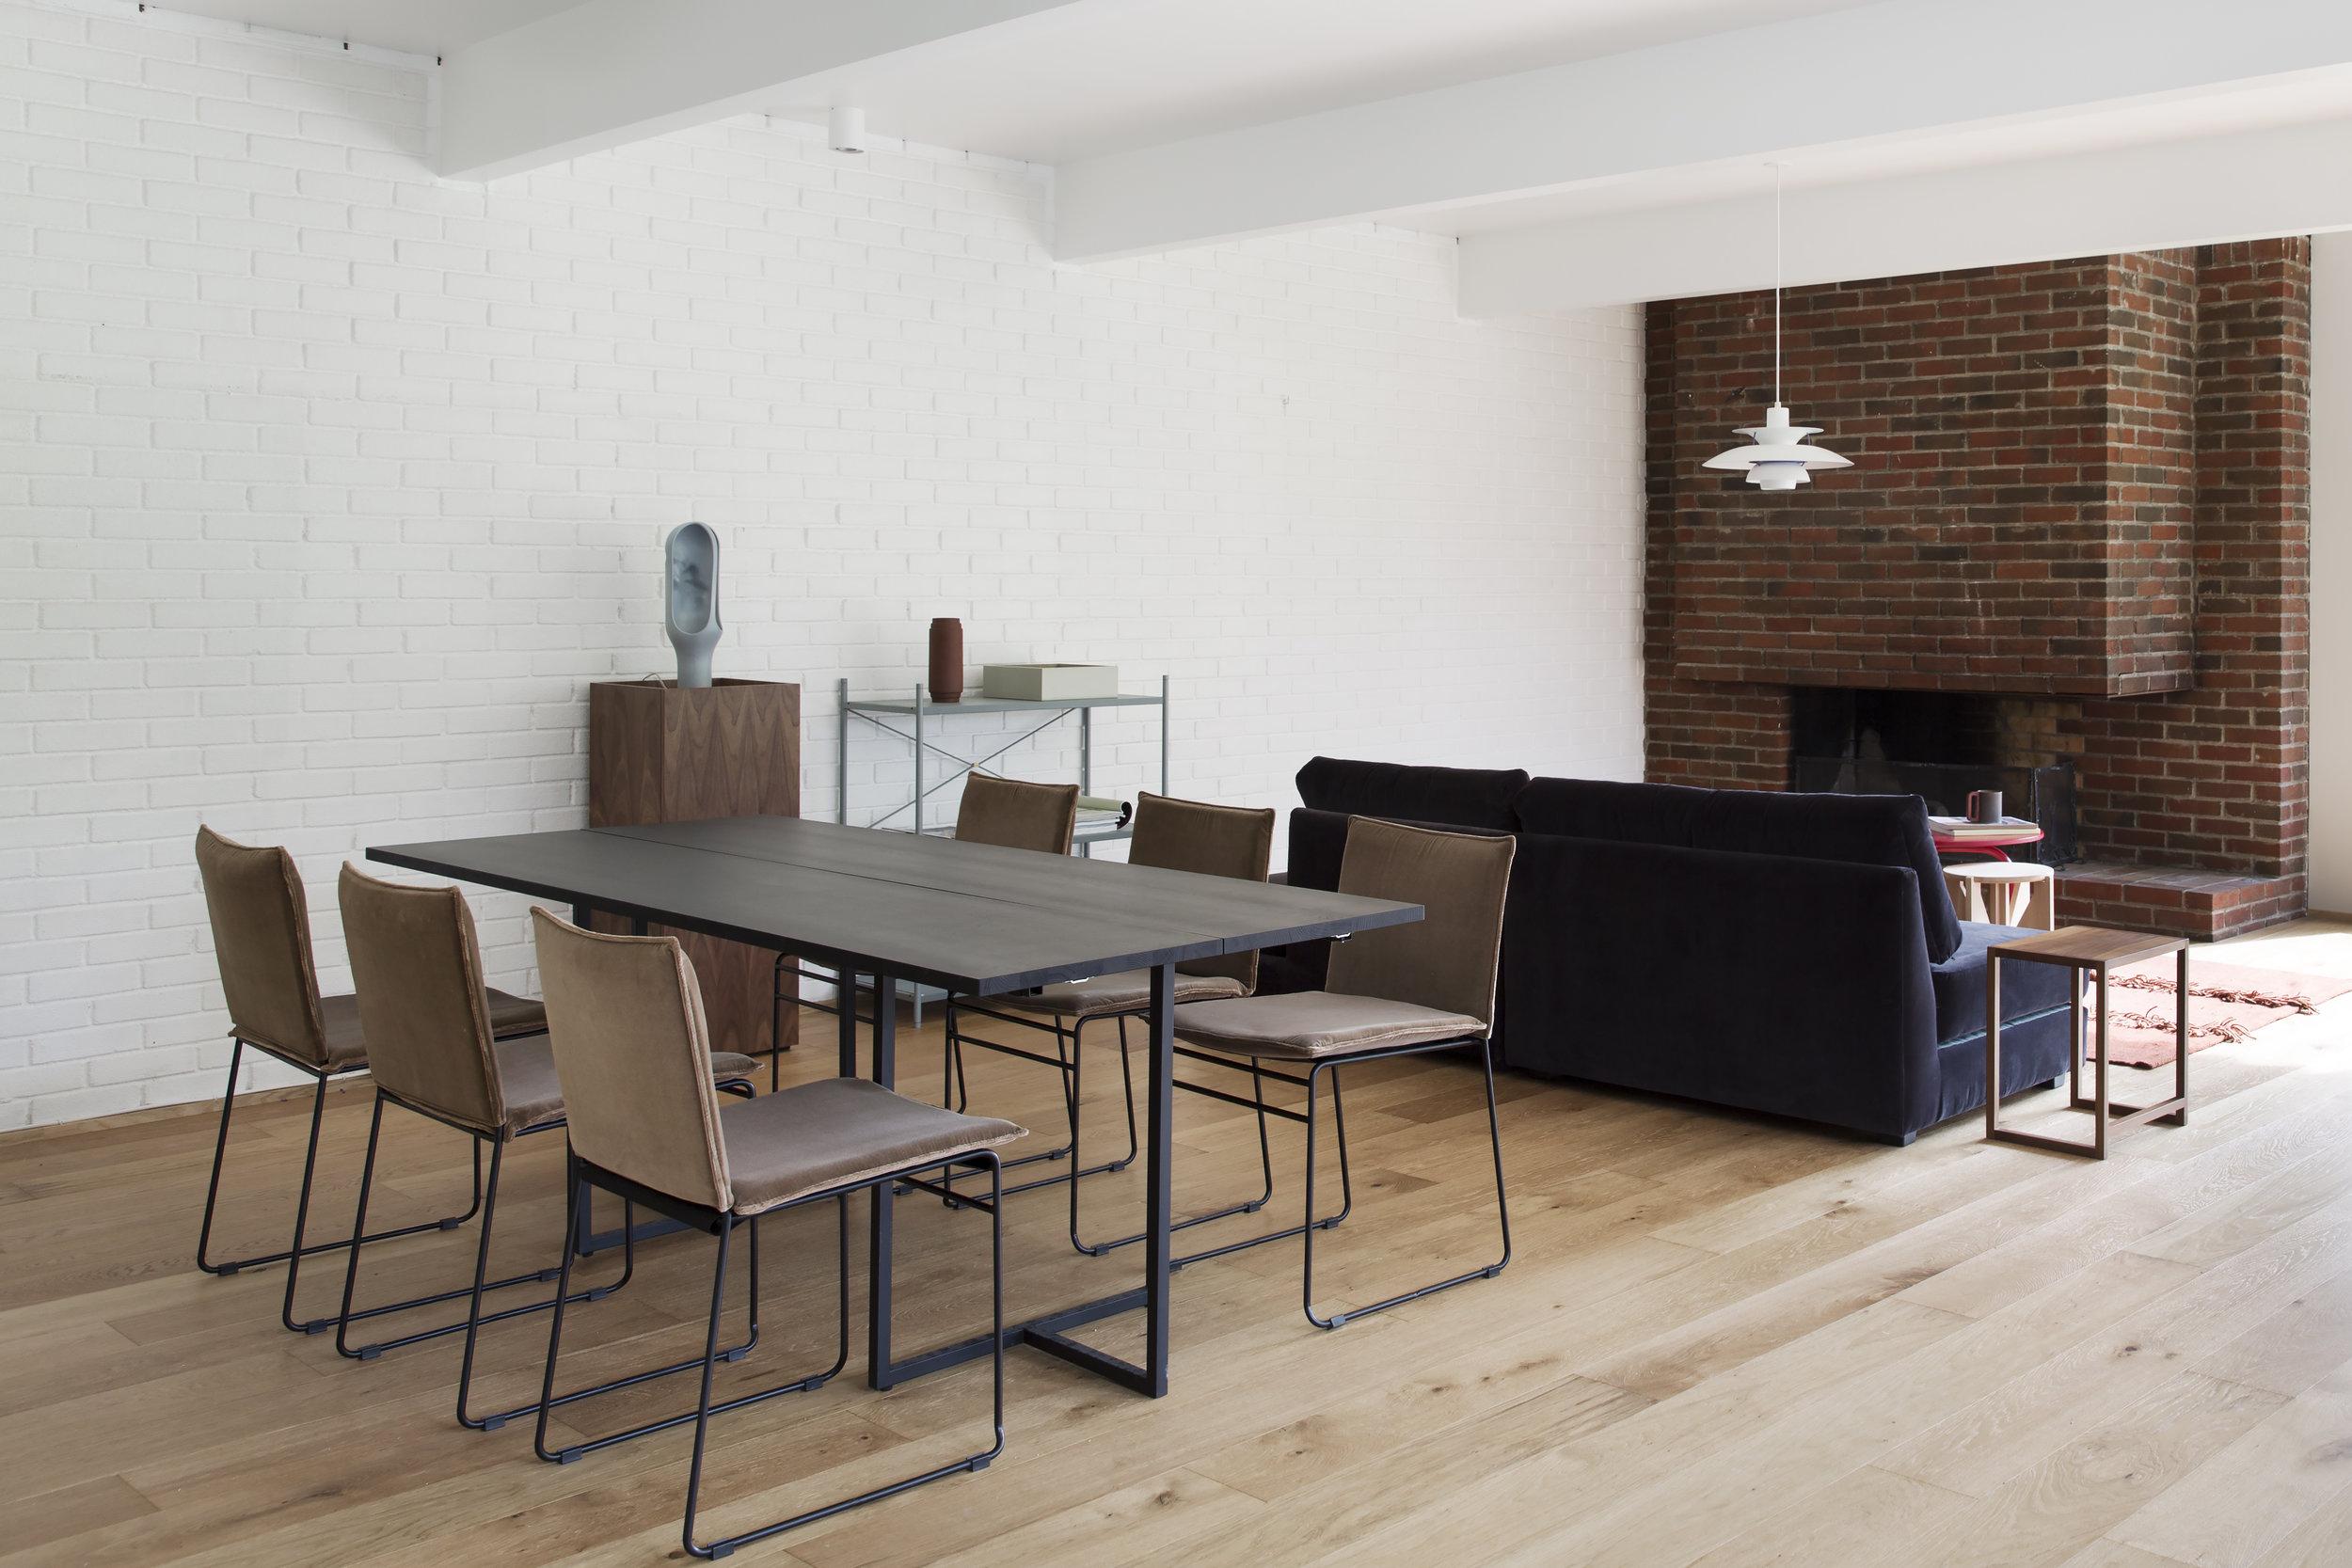 70-talls arkitektur